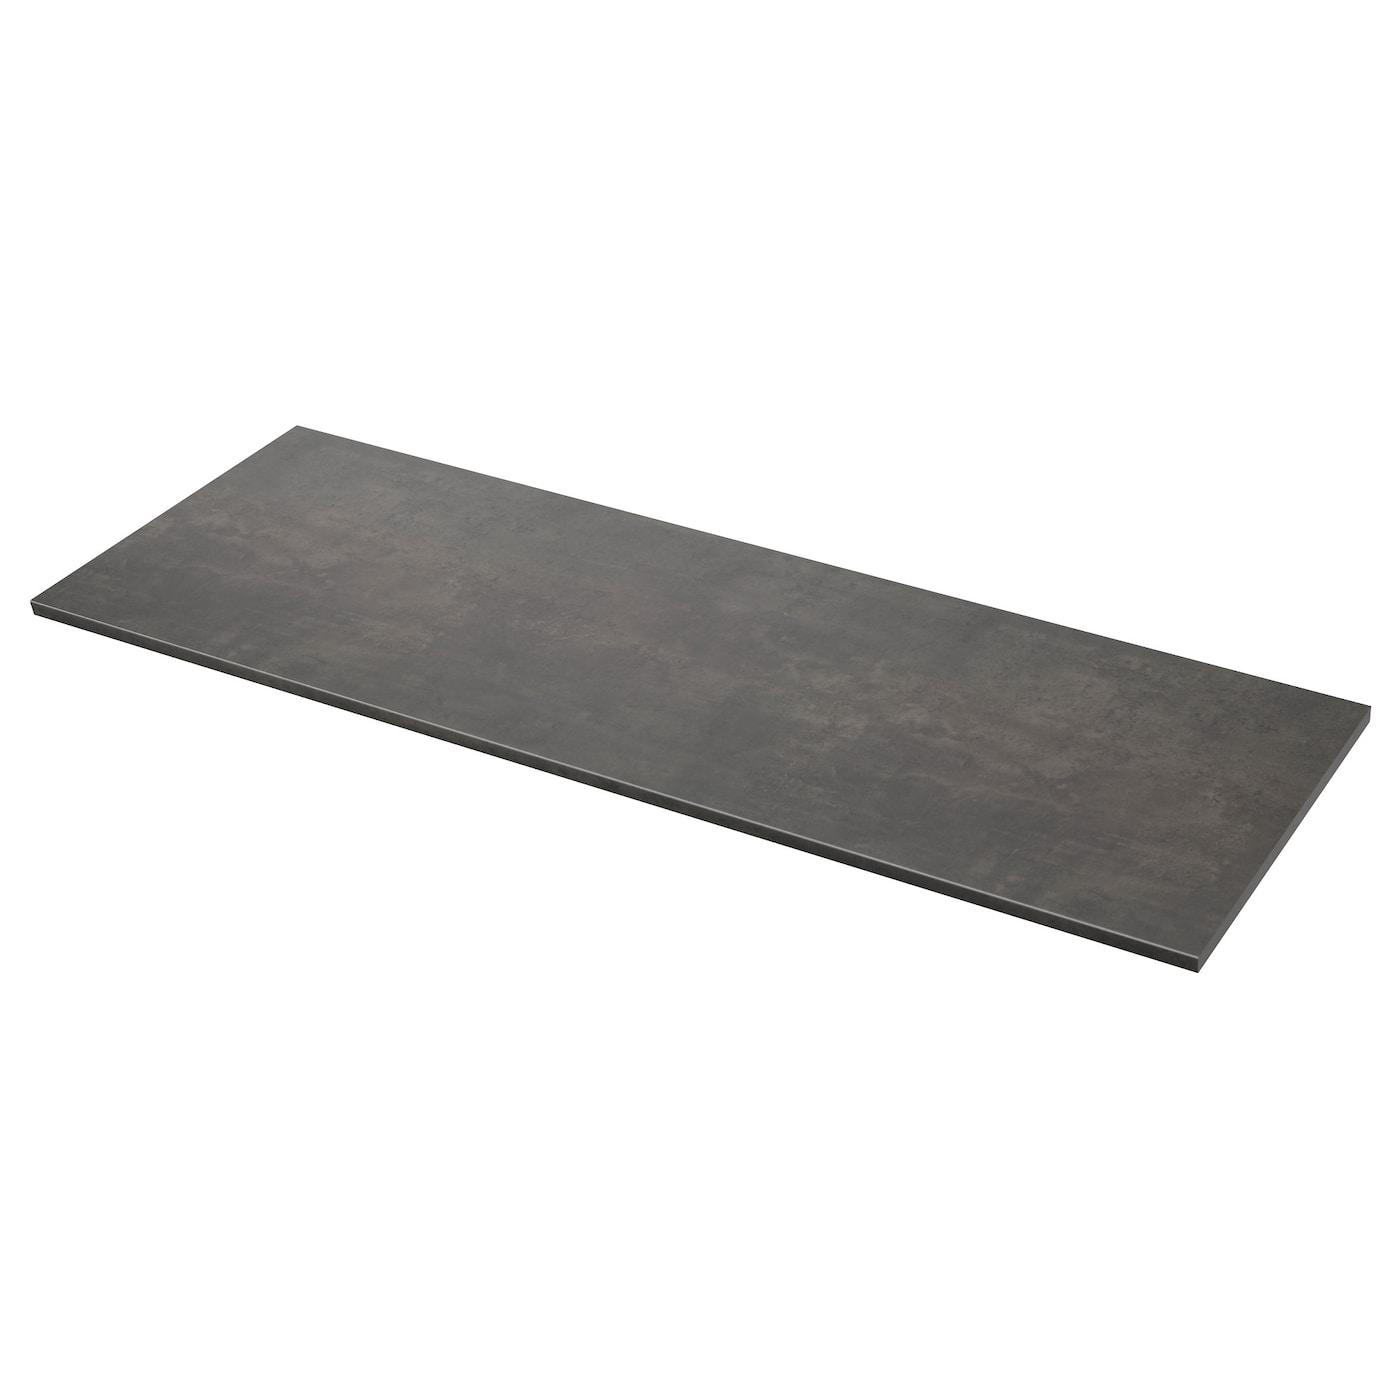 SÄLJAN Arbeitsplatte - 186x3.8 cm - IKEA